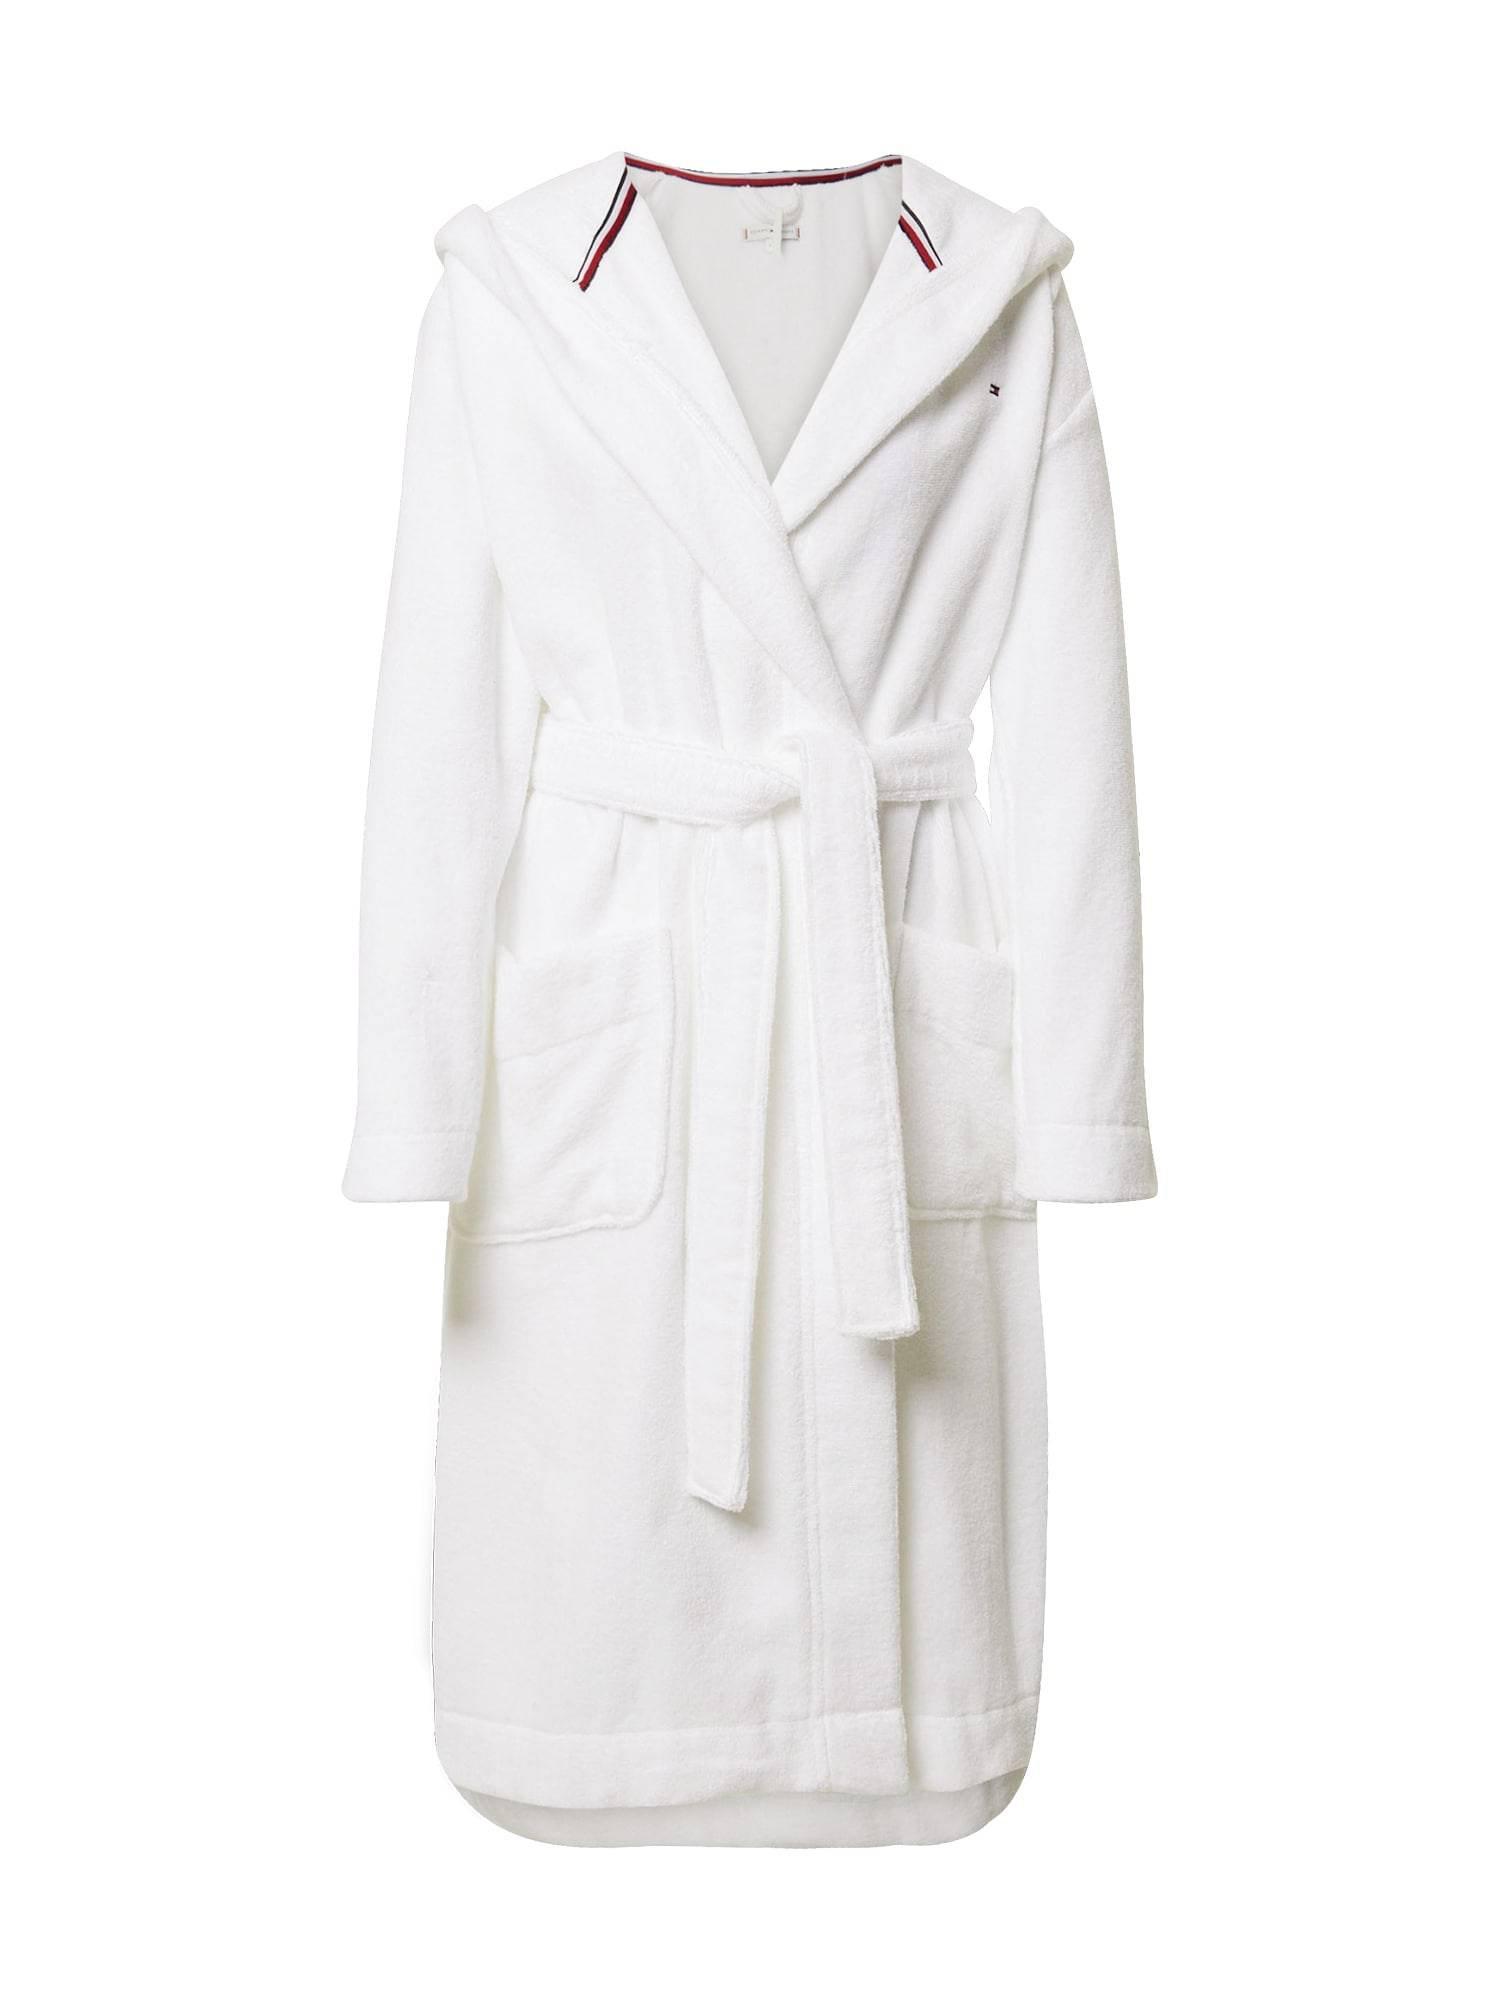 Tommy Hilfiger Underwear Accappatoio lungo Bianco